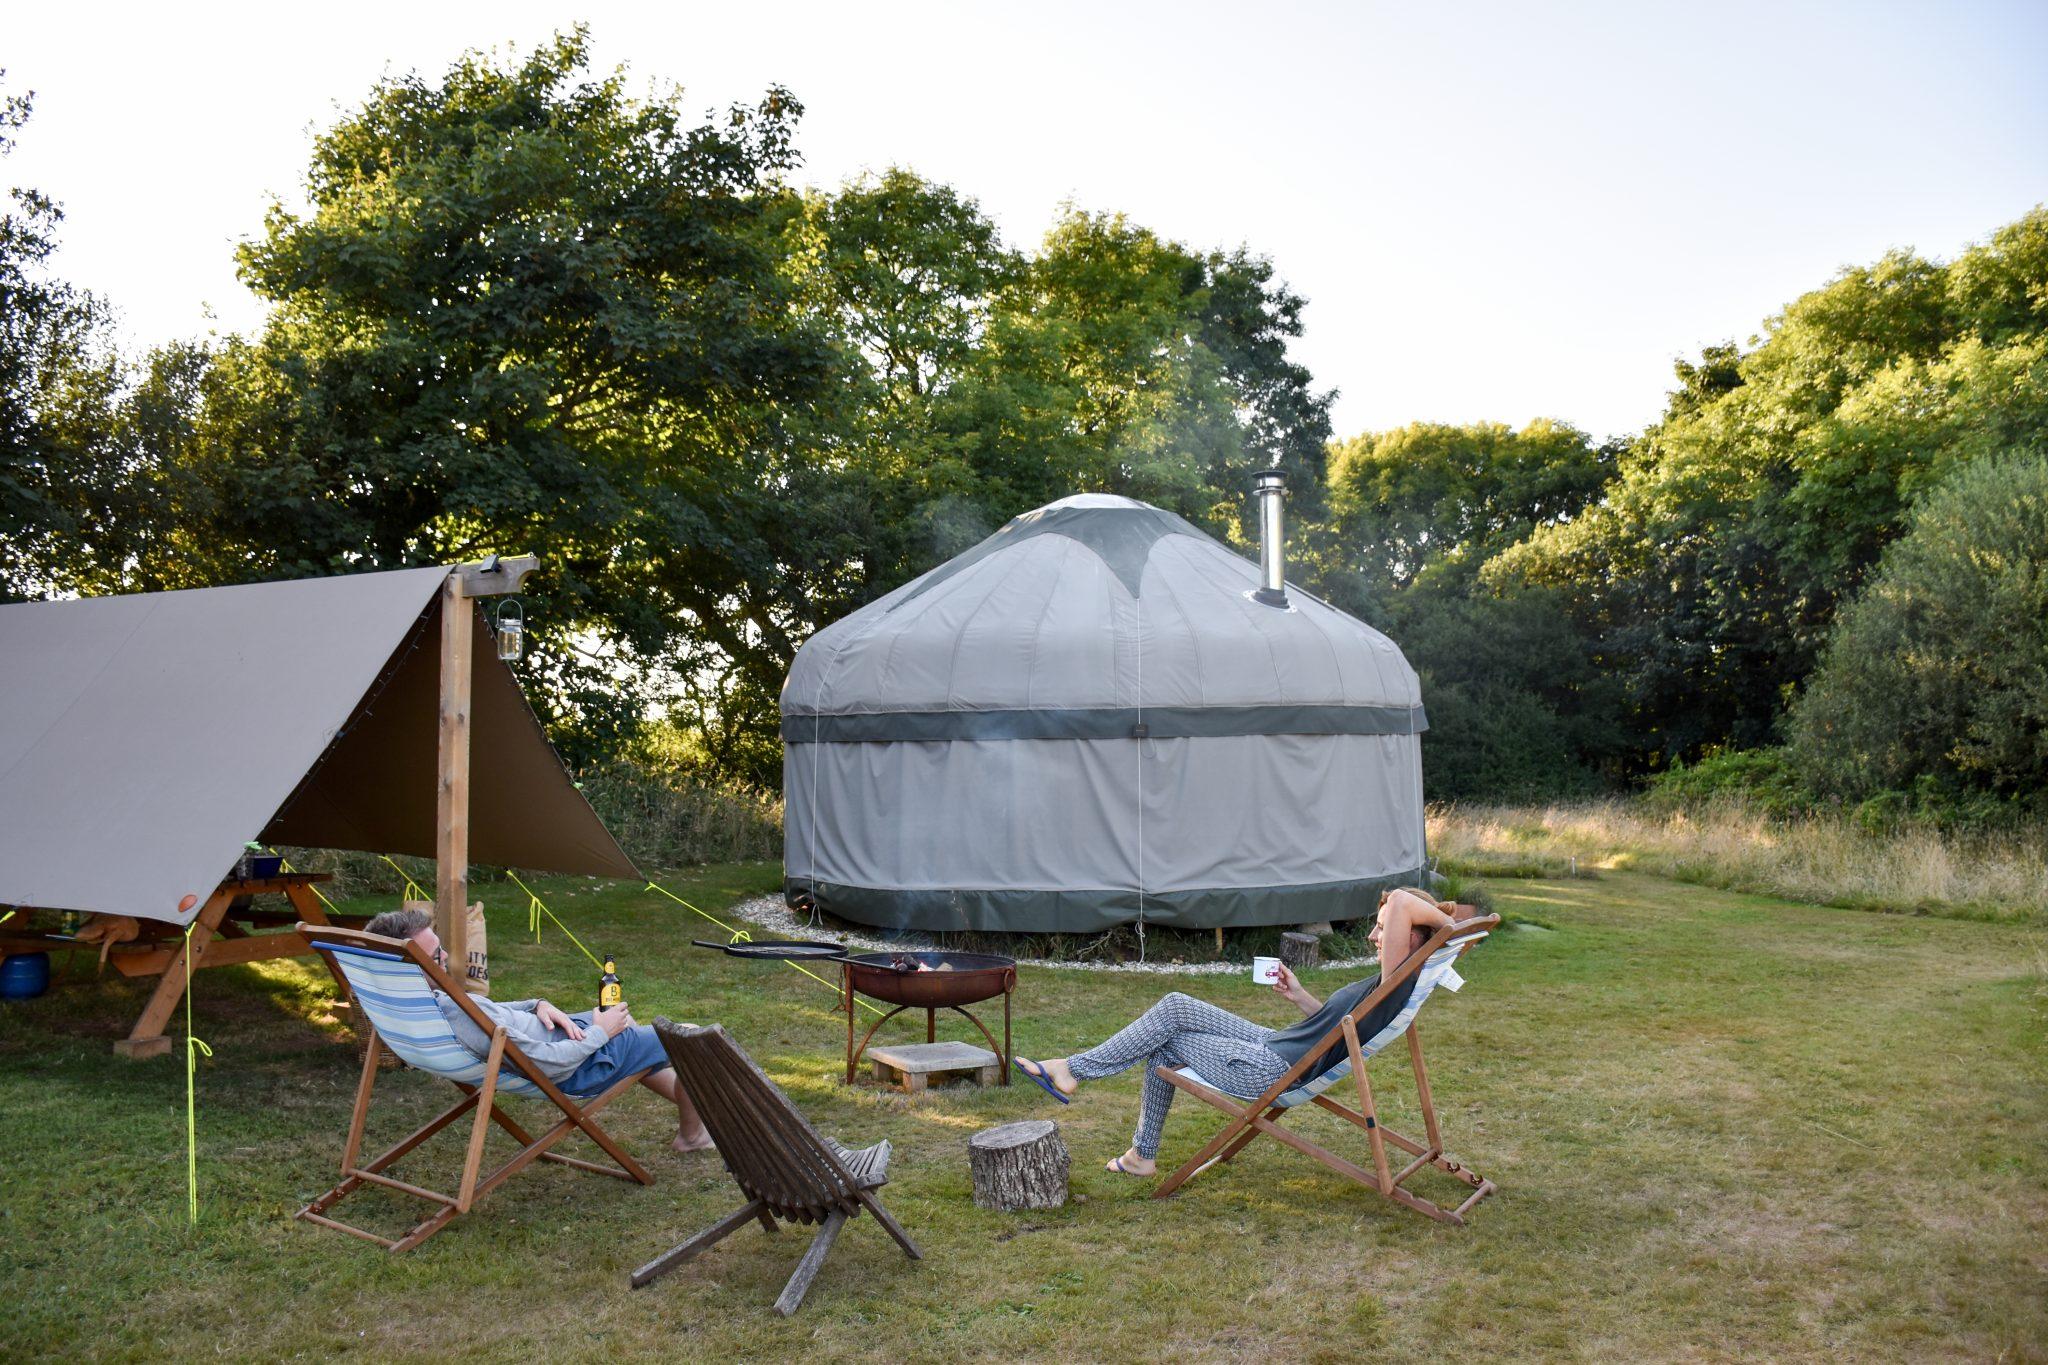 Handmade Yurts Stackpole Under The Stars